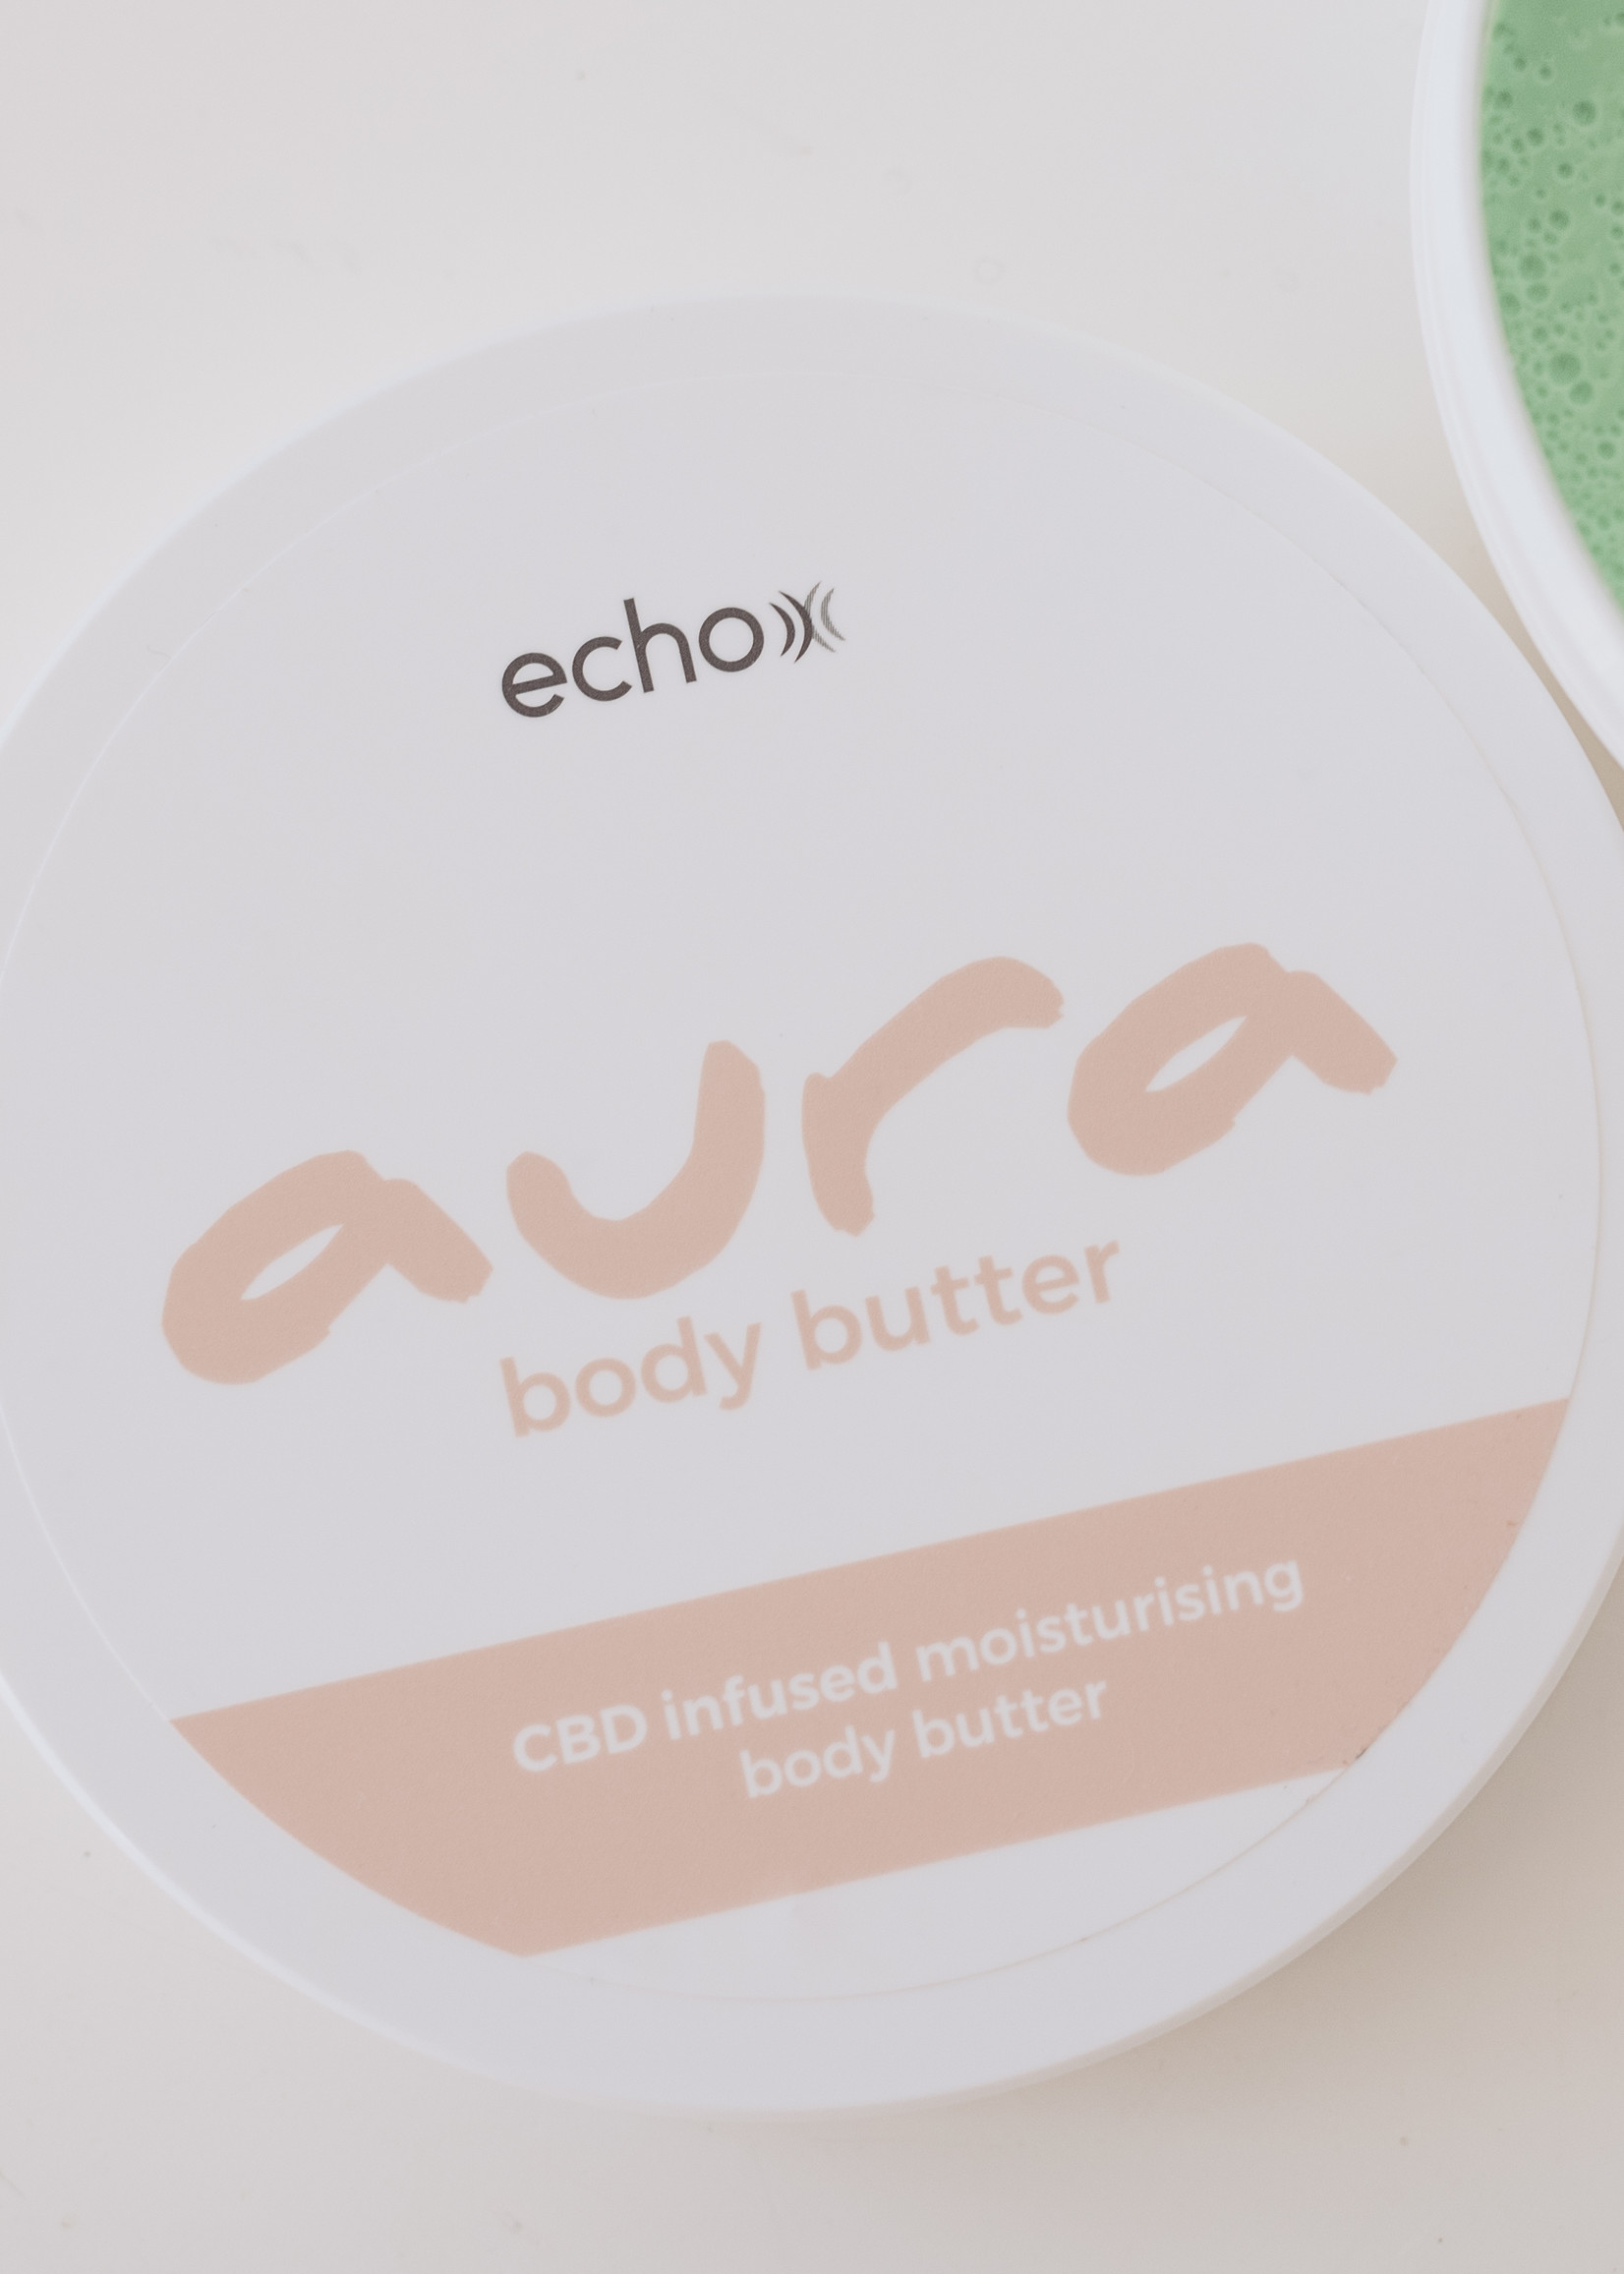 Echo CBD - Body butter